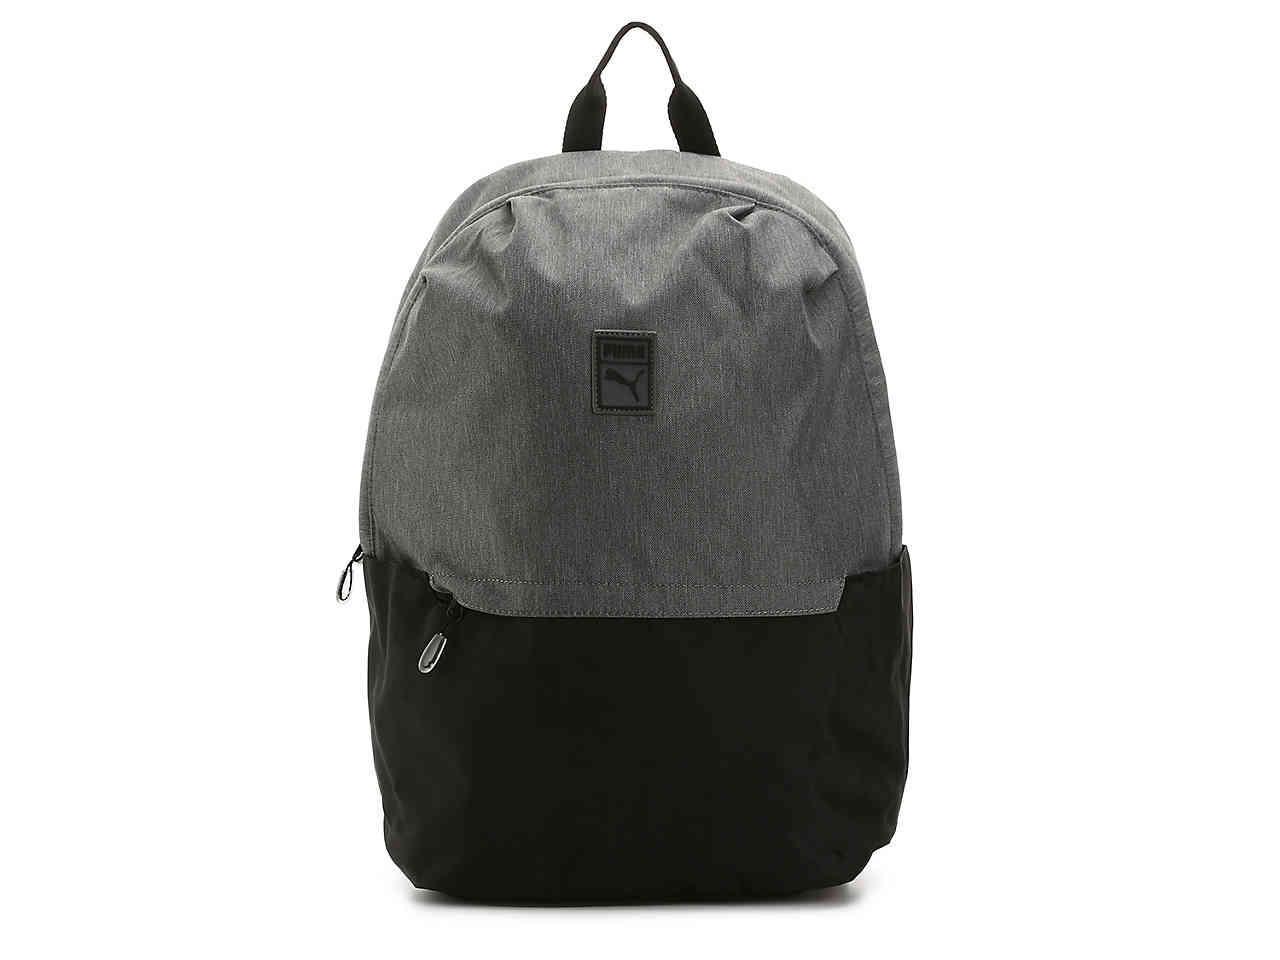 Lyst - Puma Imprint Backpack in Black 7427e97687